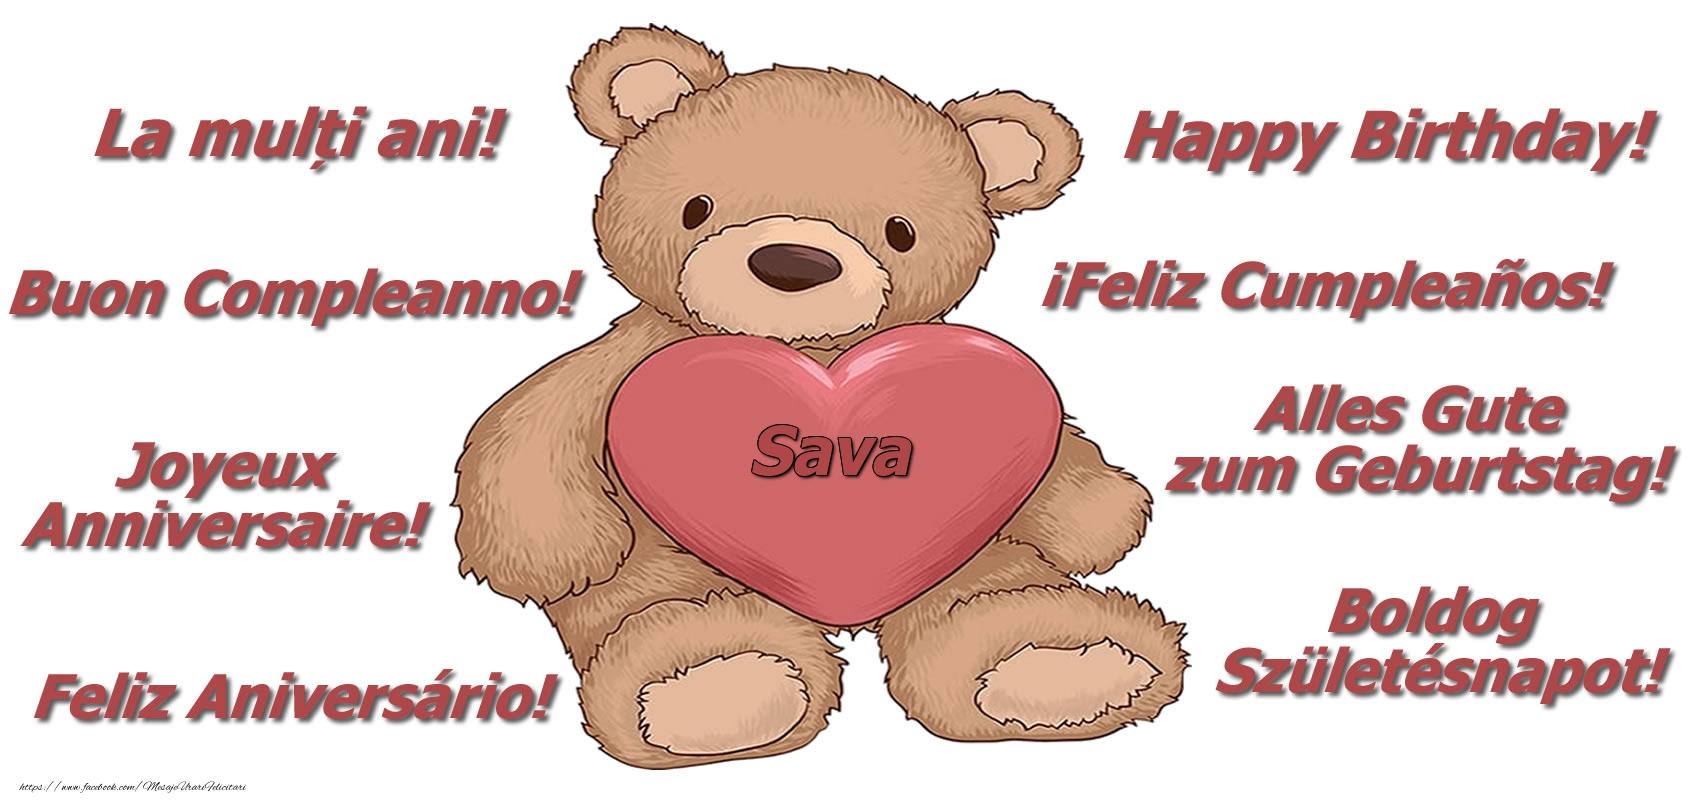 Felicitari de zi de nastere - La multi ani Sava! - Ursulet